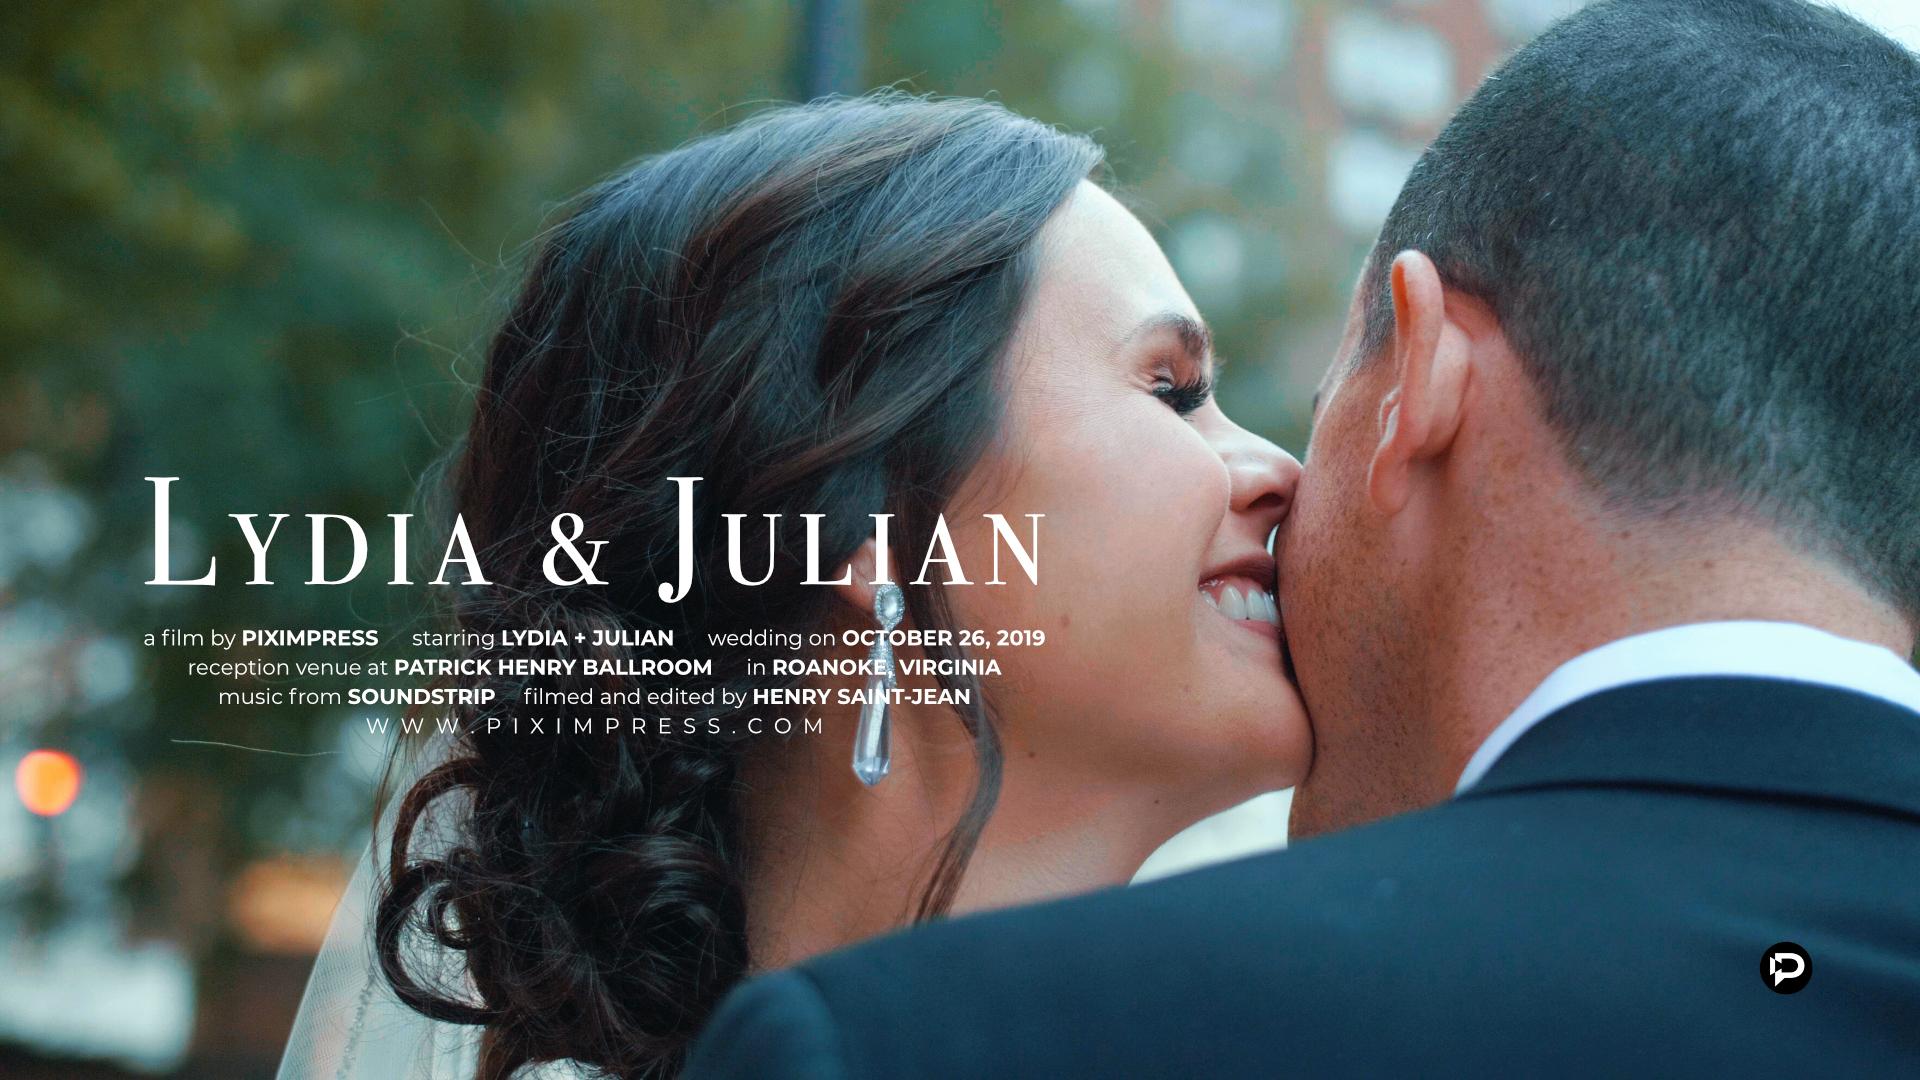 Lydia + Julian | Roanoke, Virginia | The Patrick Henry Ballroom